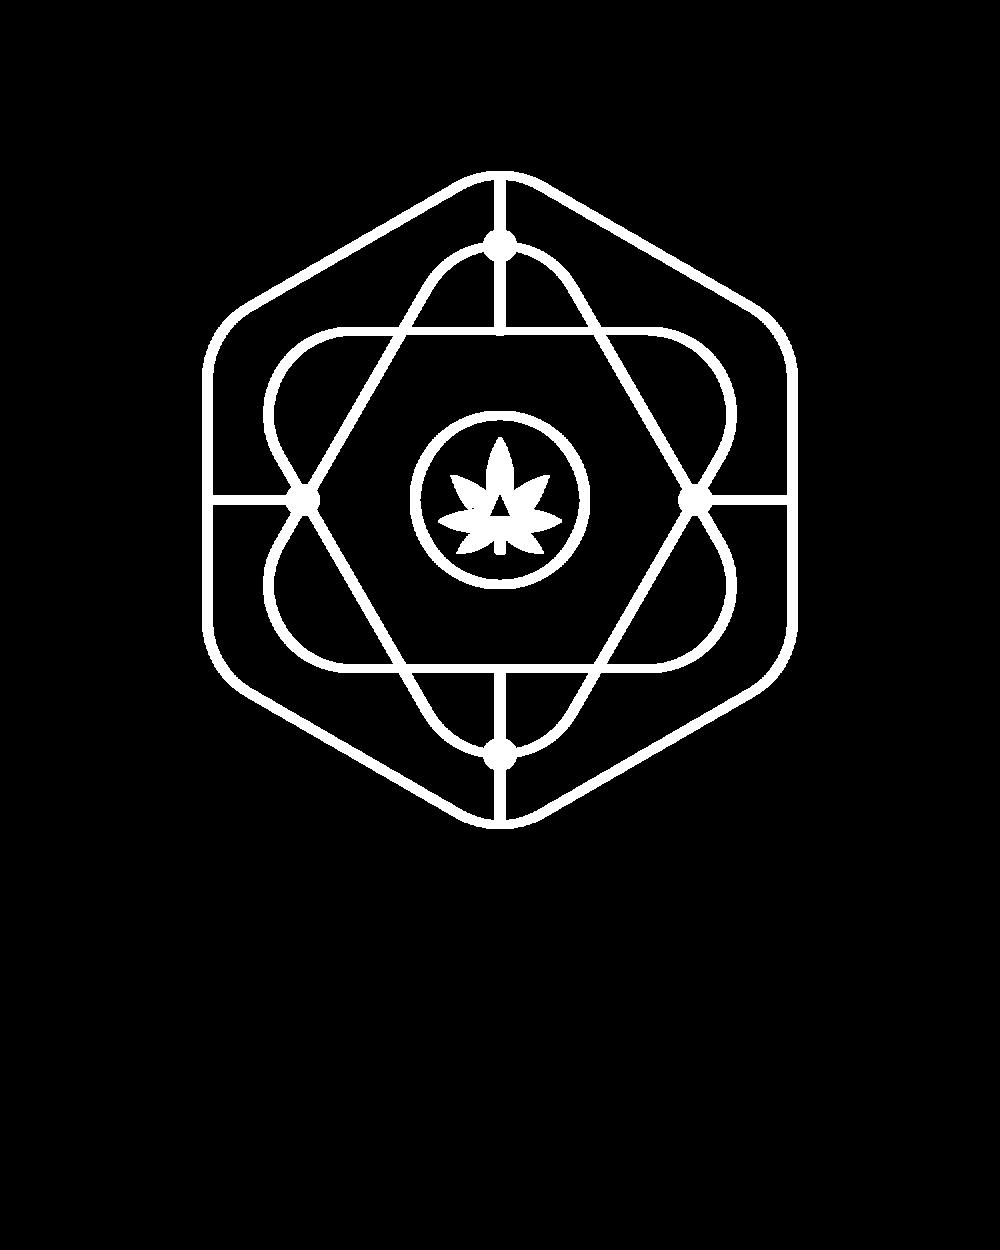 sacred_leaf_web_icon.png